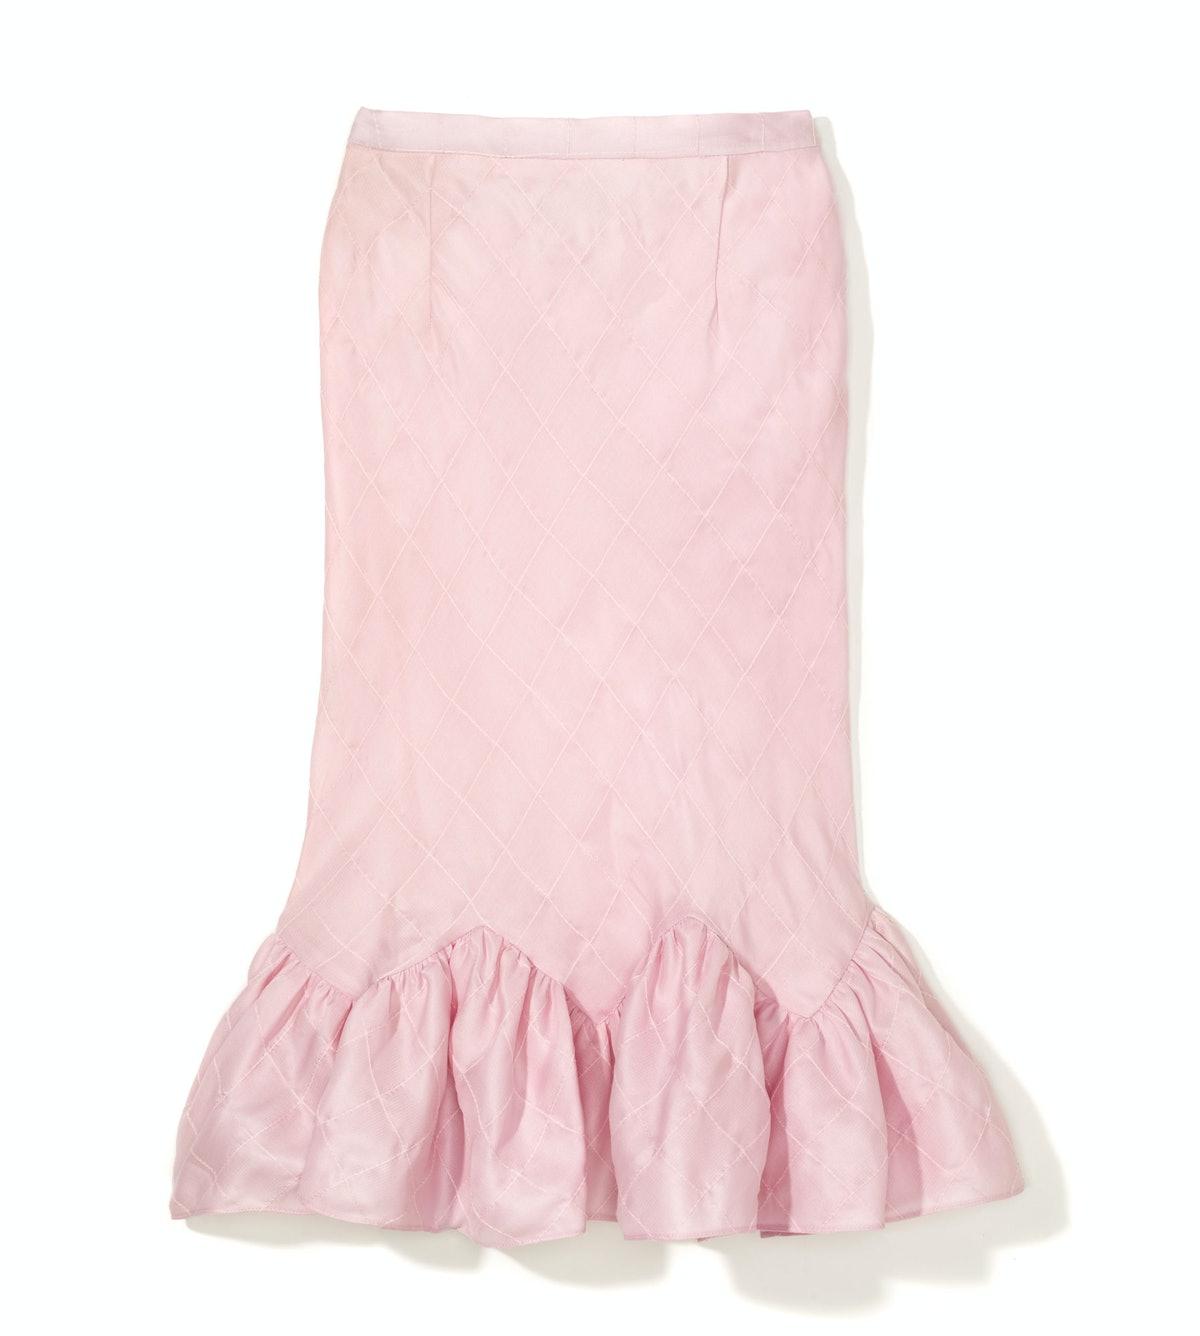 Nonoo skirt, $595, [shopbop.com](http://rstyle.me/n/meek3w3n).